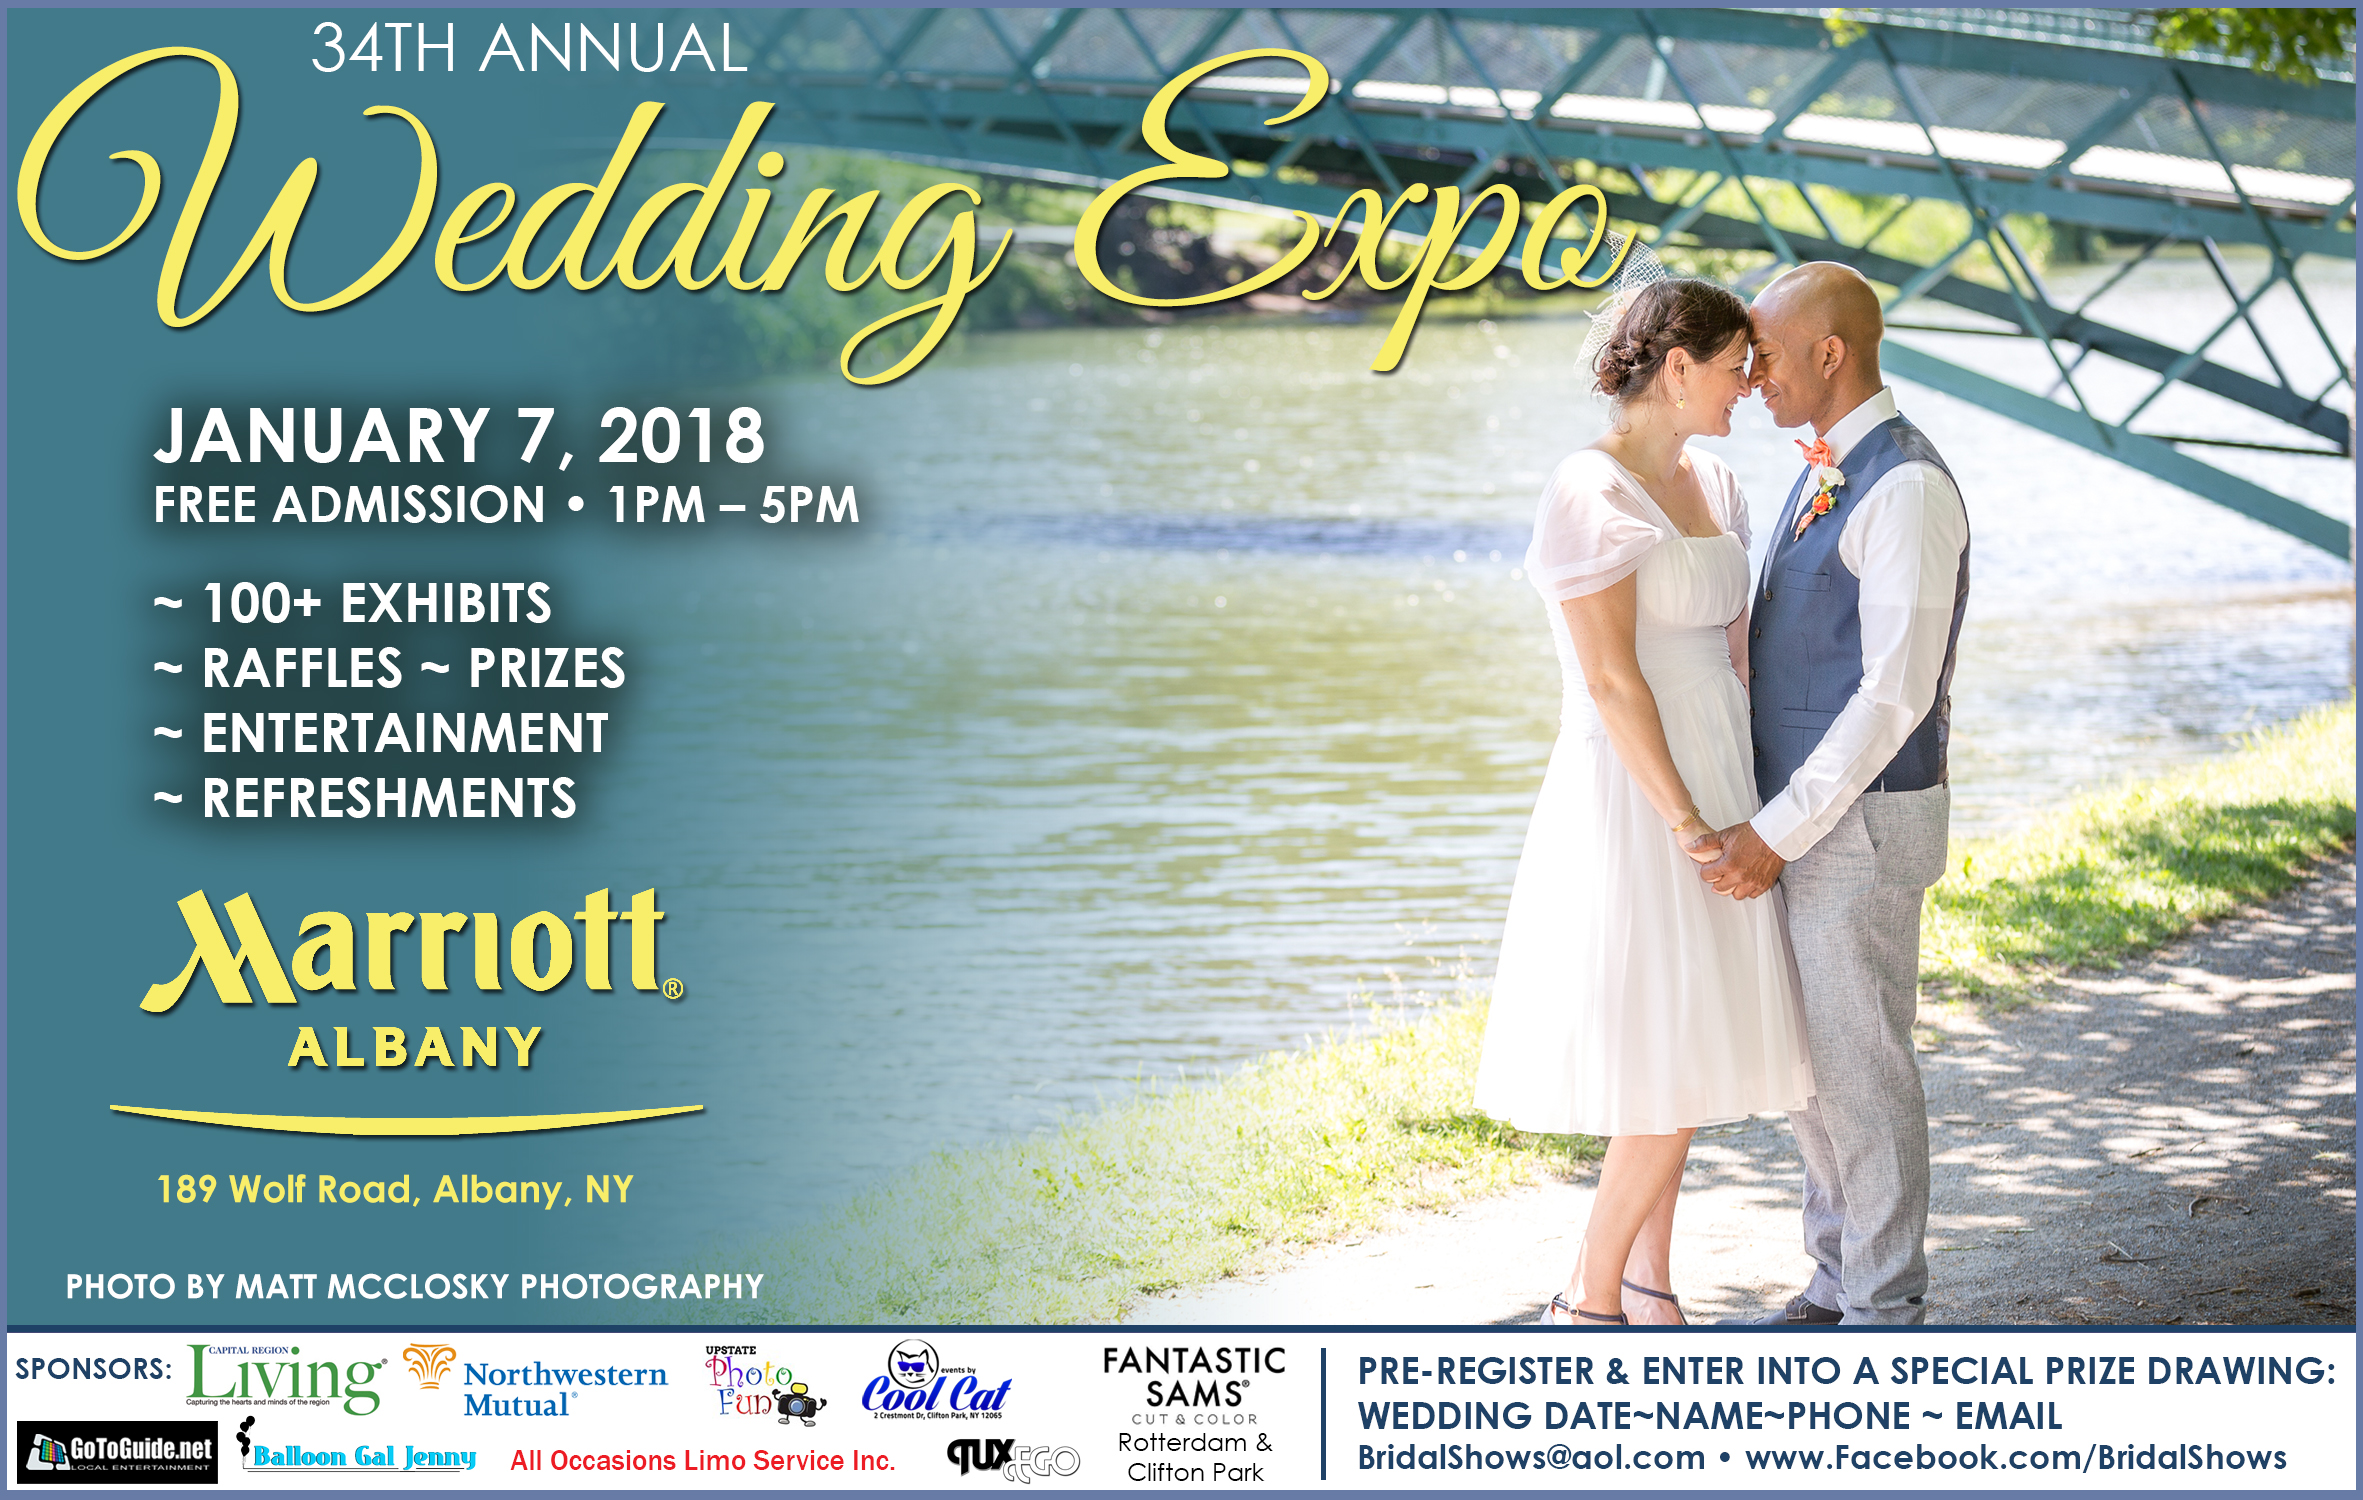 Albany Marriott Wedding Bridal Expo Matt McClosky Photography 518Wedding.com 2018